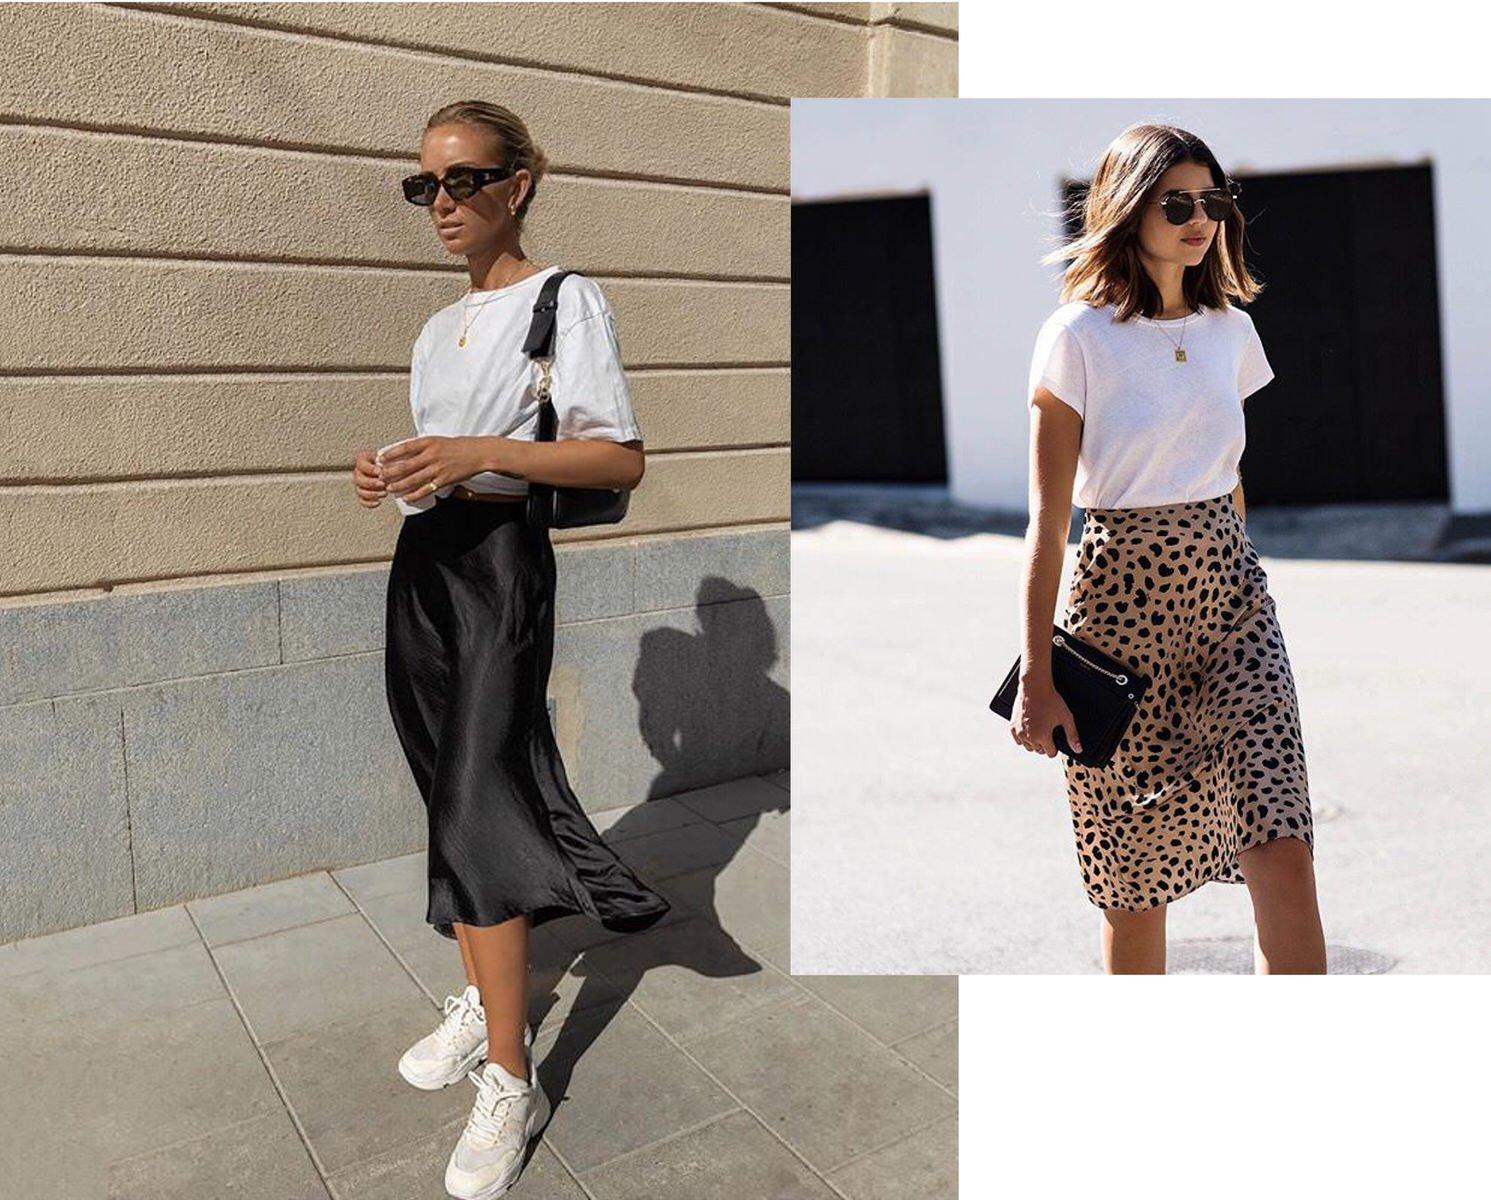 Midi Skirt Spring Street Style